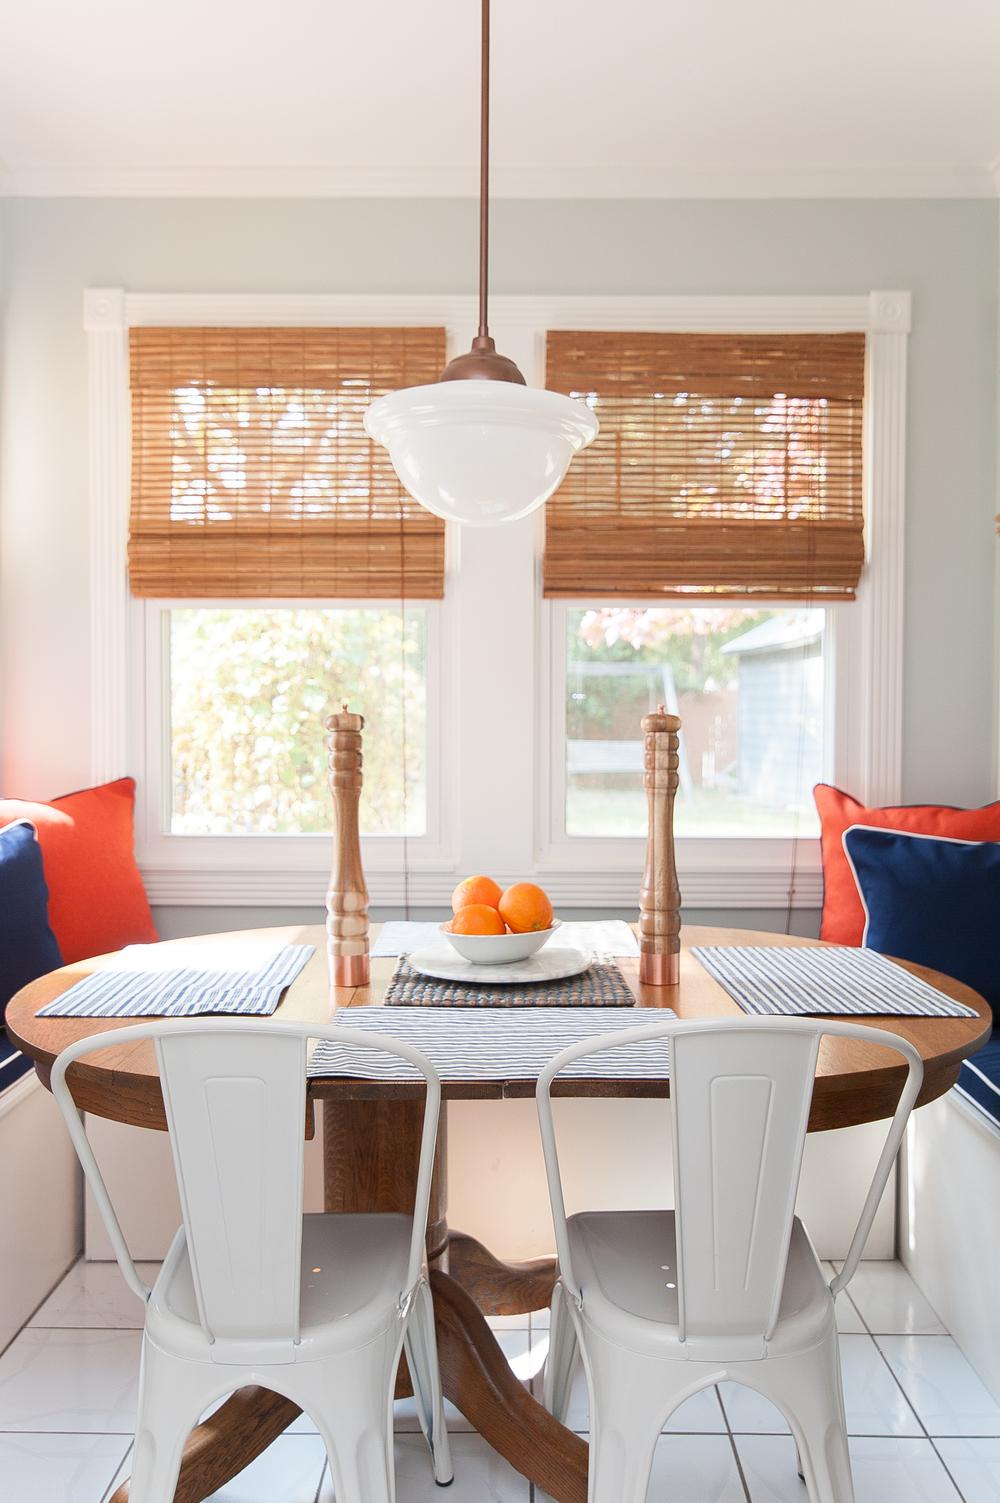 Artful Interiors – Bachelor Pad - Kitchen